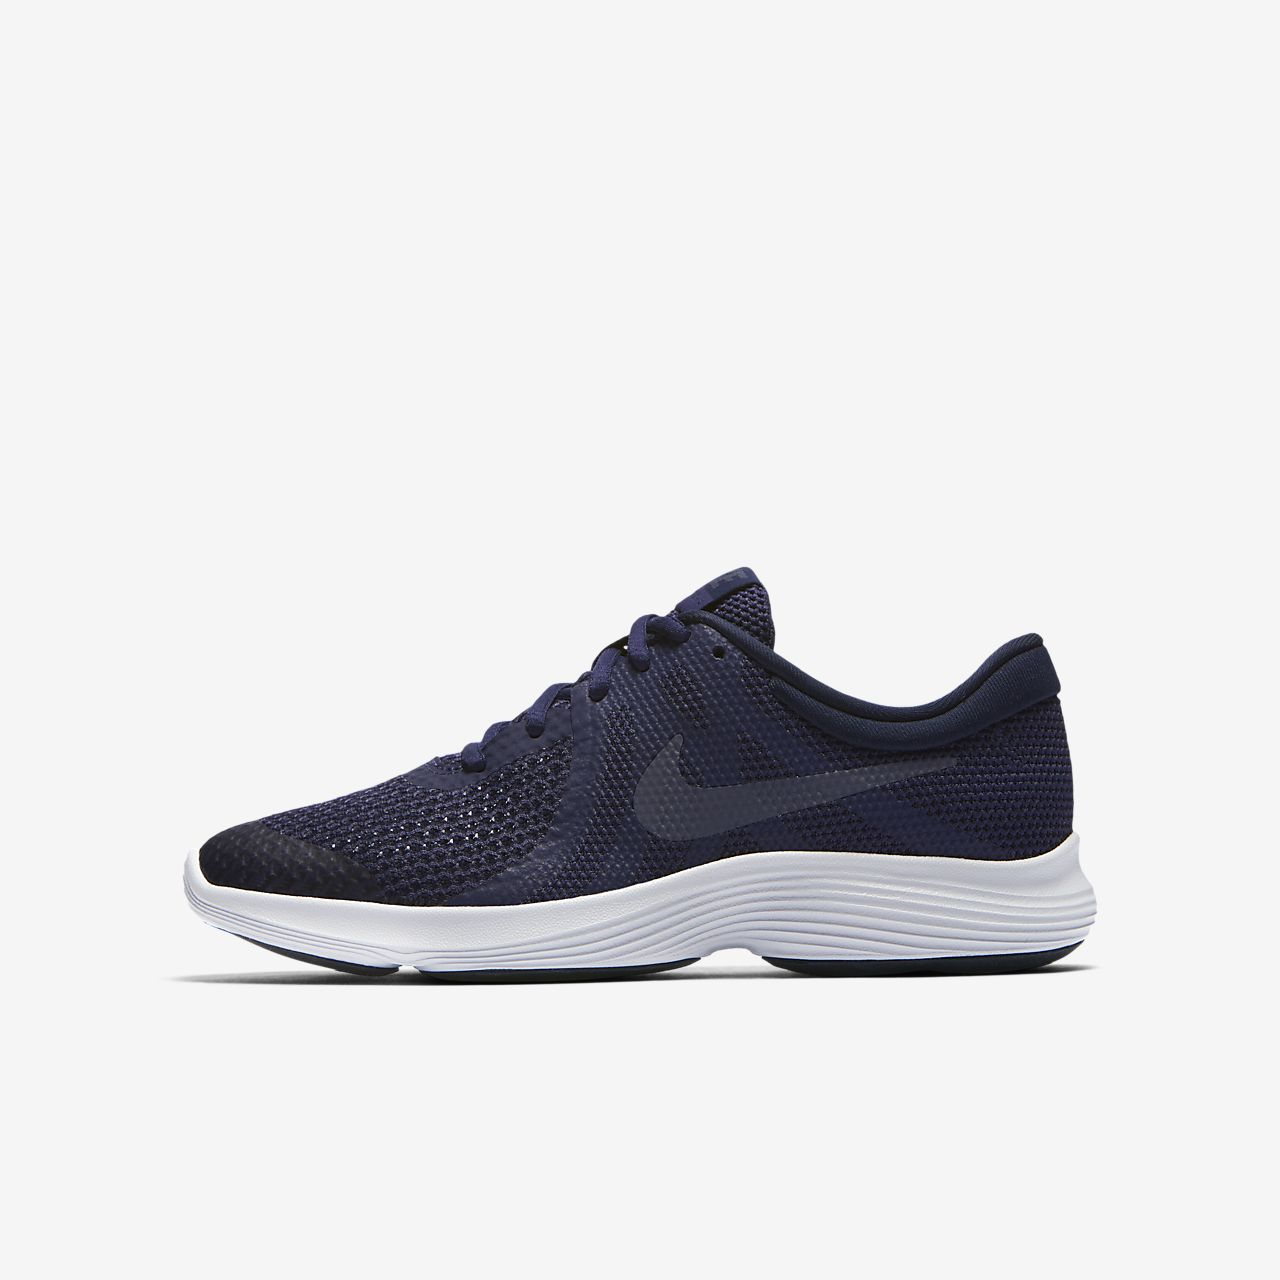 4 ältere Kinder Revolution Laufschuh Big Nike für hdBsrCQtxo